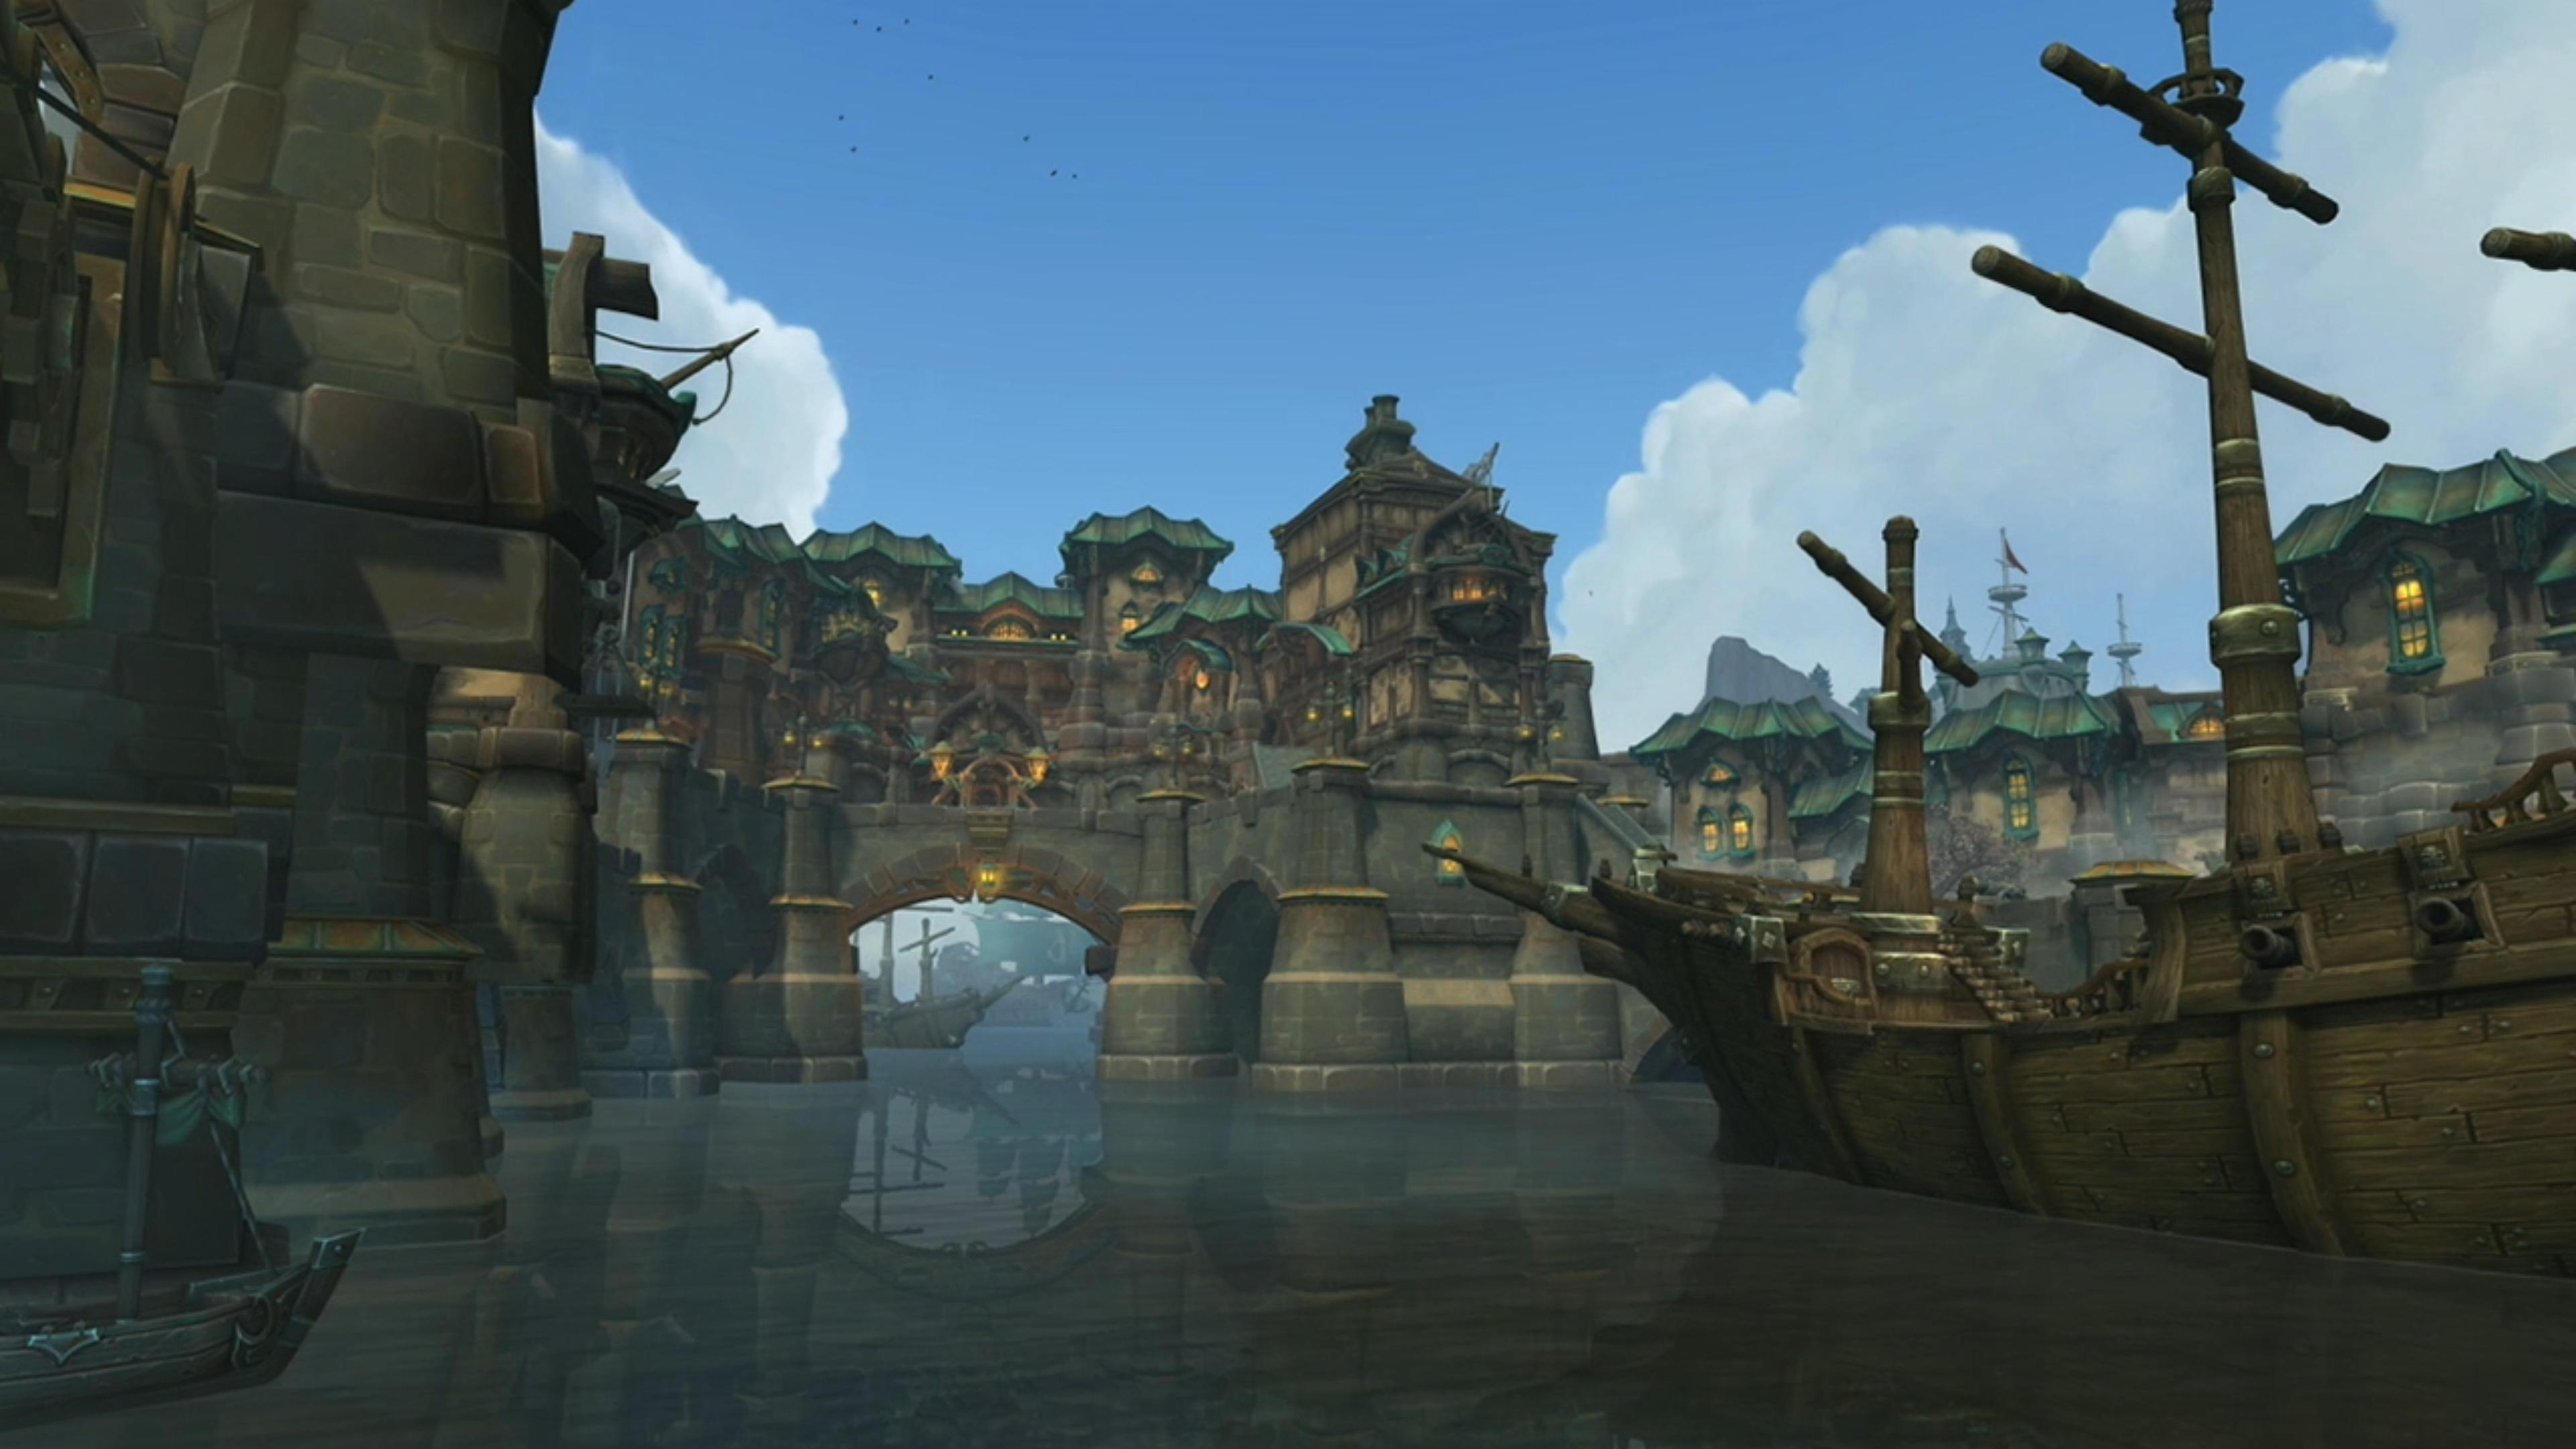 Design A Dungeon Boss Live BlizzCon 2017 - Wowhead News